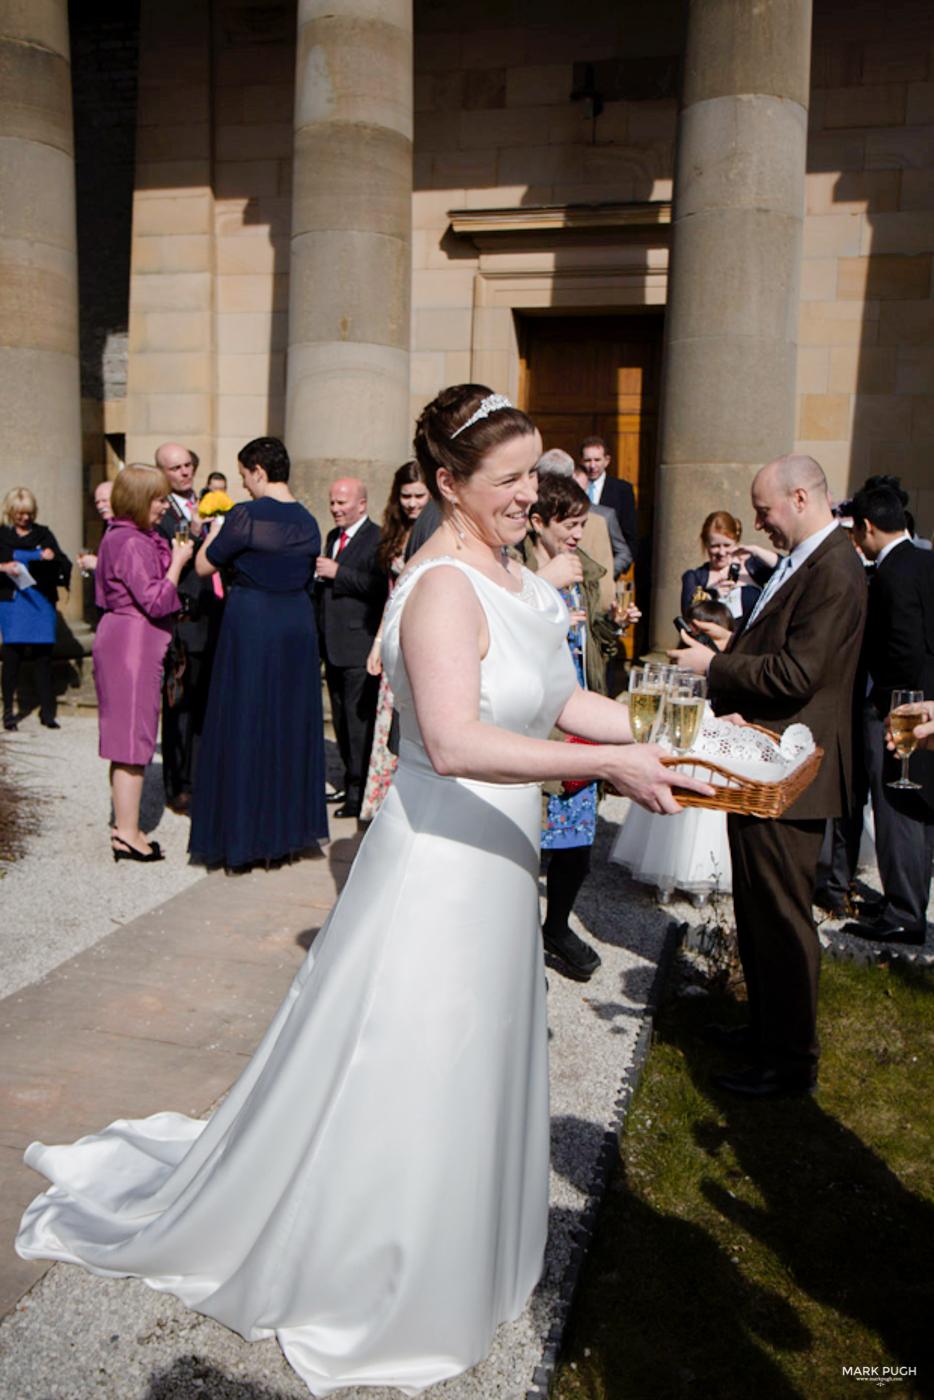 069  - Helen and Tim - Wedding Photography at Chatsworth House Bakewell Derbyshire DE45 1PP - Wedding Photographer Mark Pugh www.markpugh.com -141.JPG